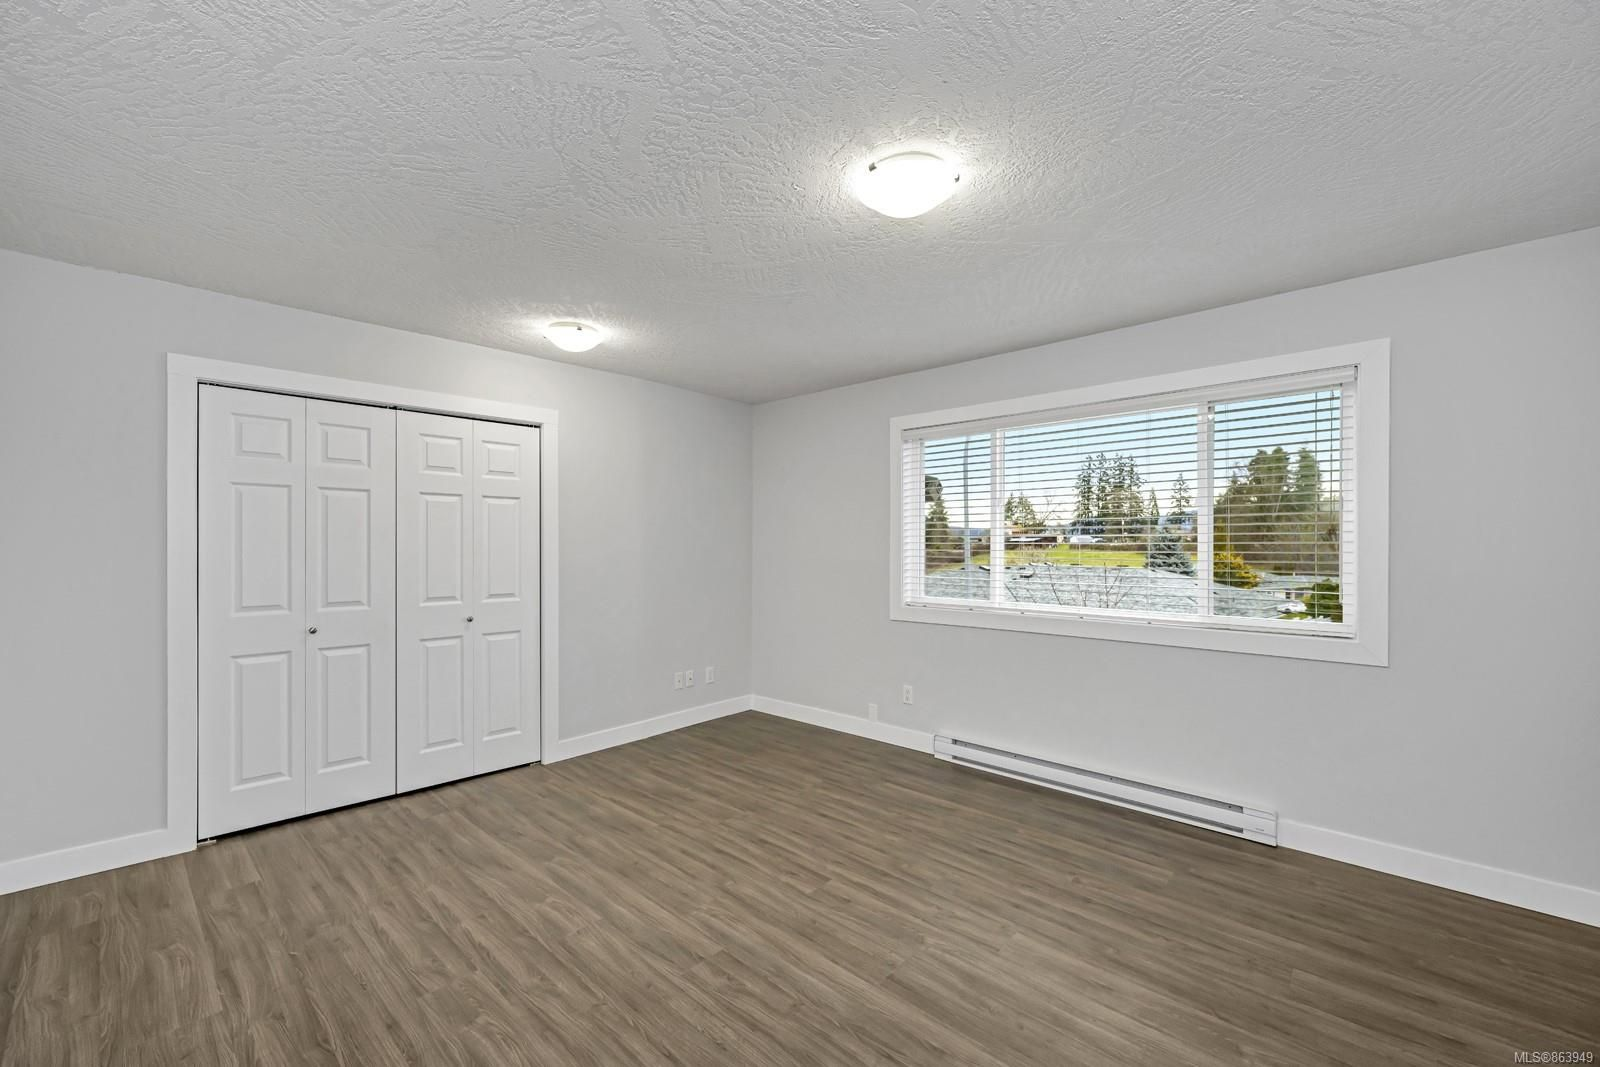 Photo 22: Photos: 6154 Sayward Rd in : Du West Duncan Half Duplex for sale (Duncan)  : MLS®# 863949